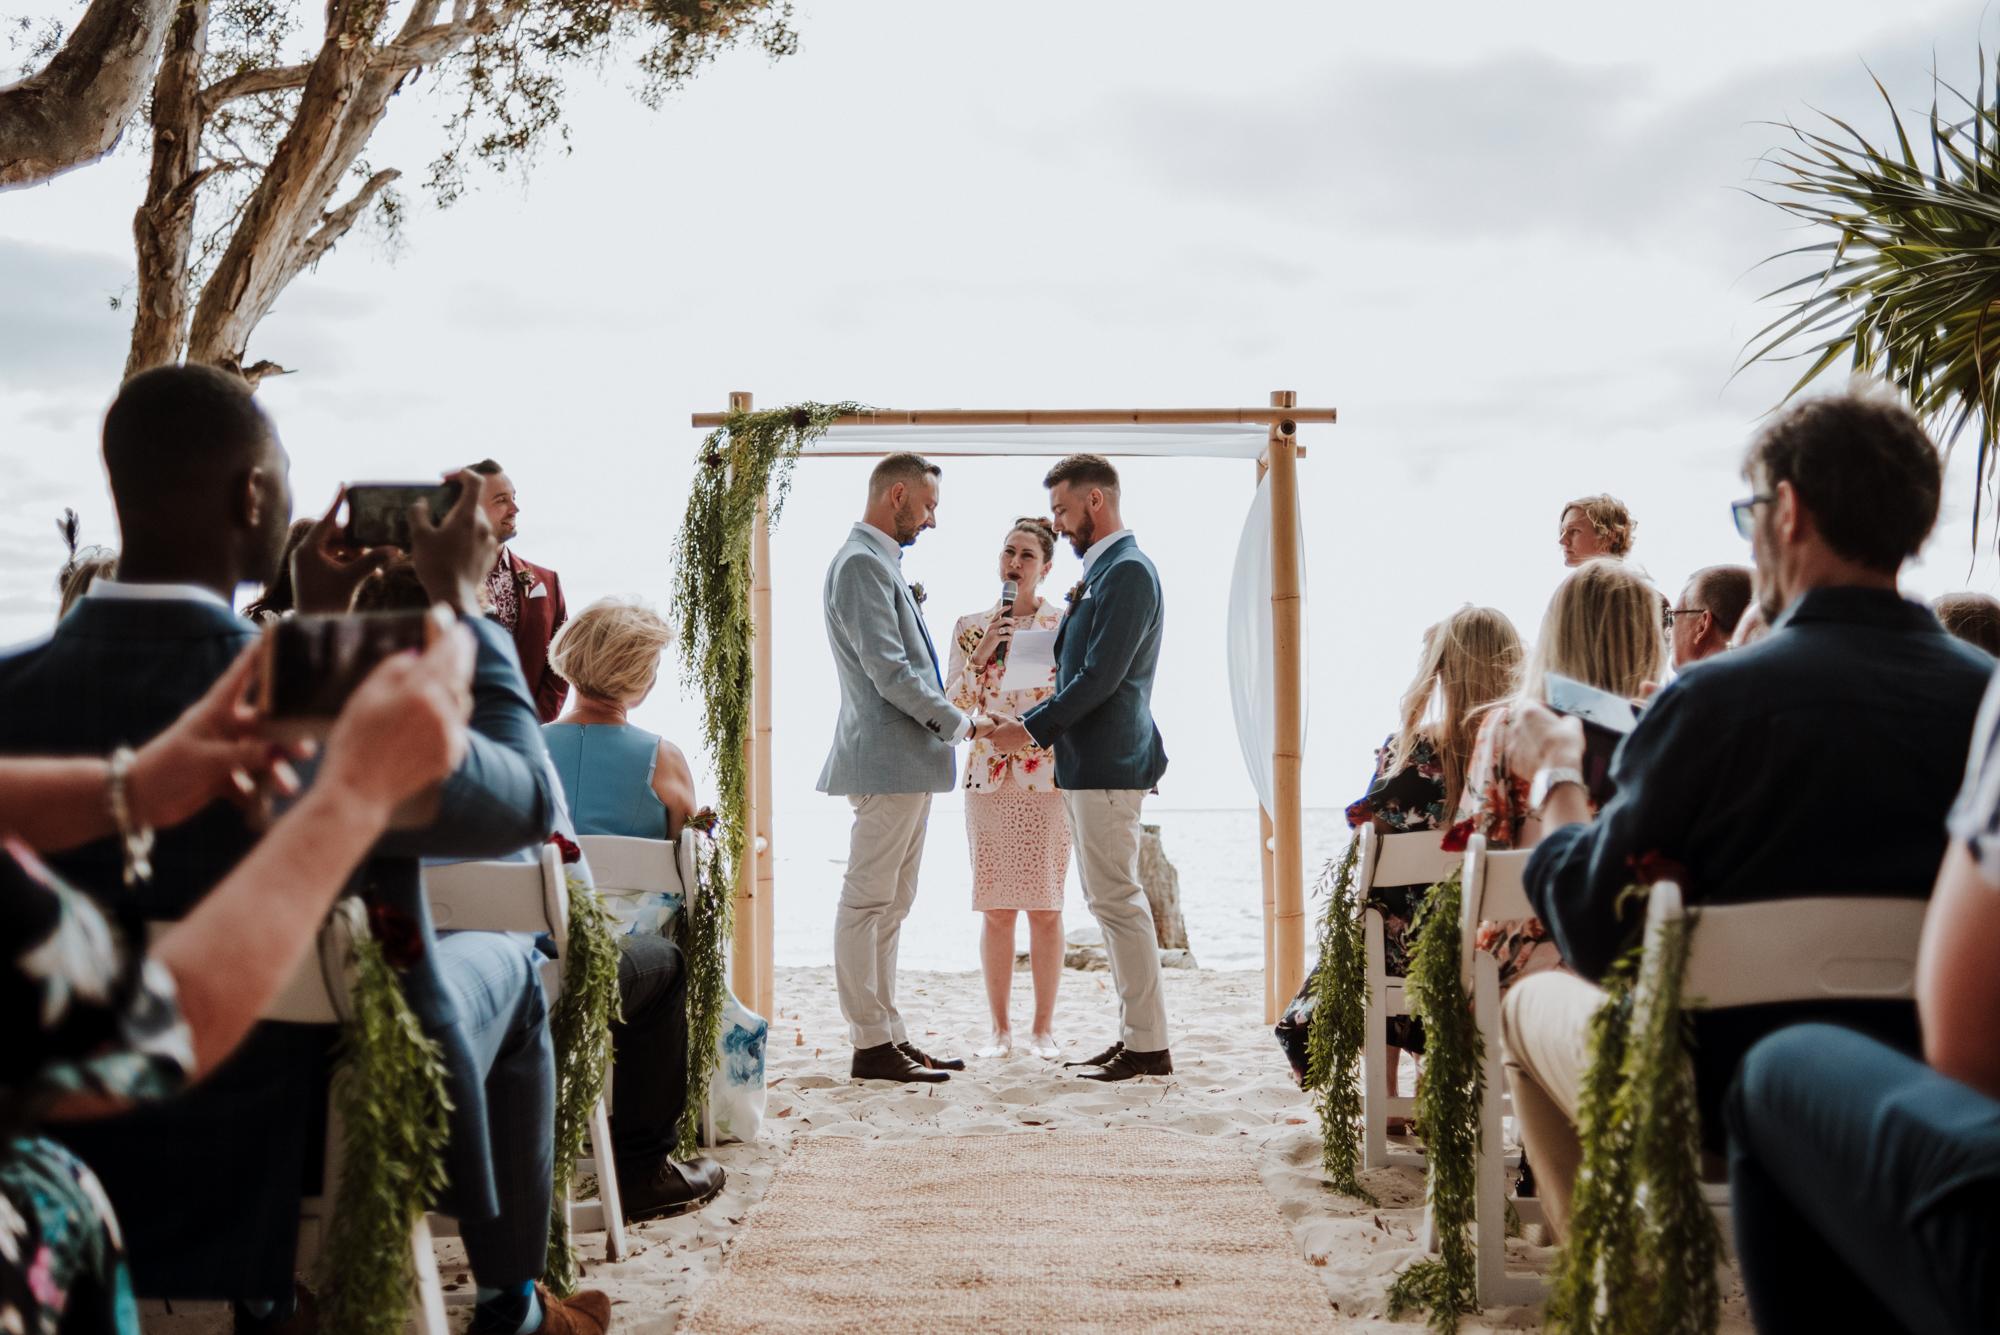 jessica-howard-photography-sean-alessandro-wedding-day-web-238.jpg